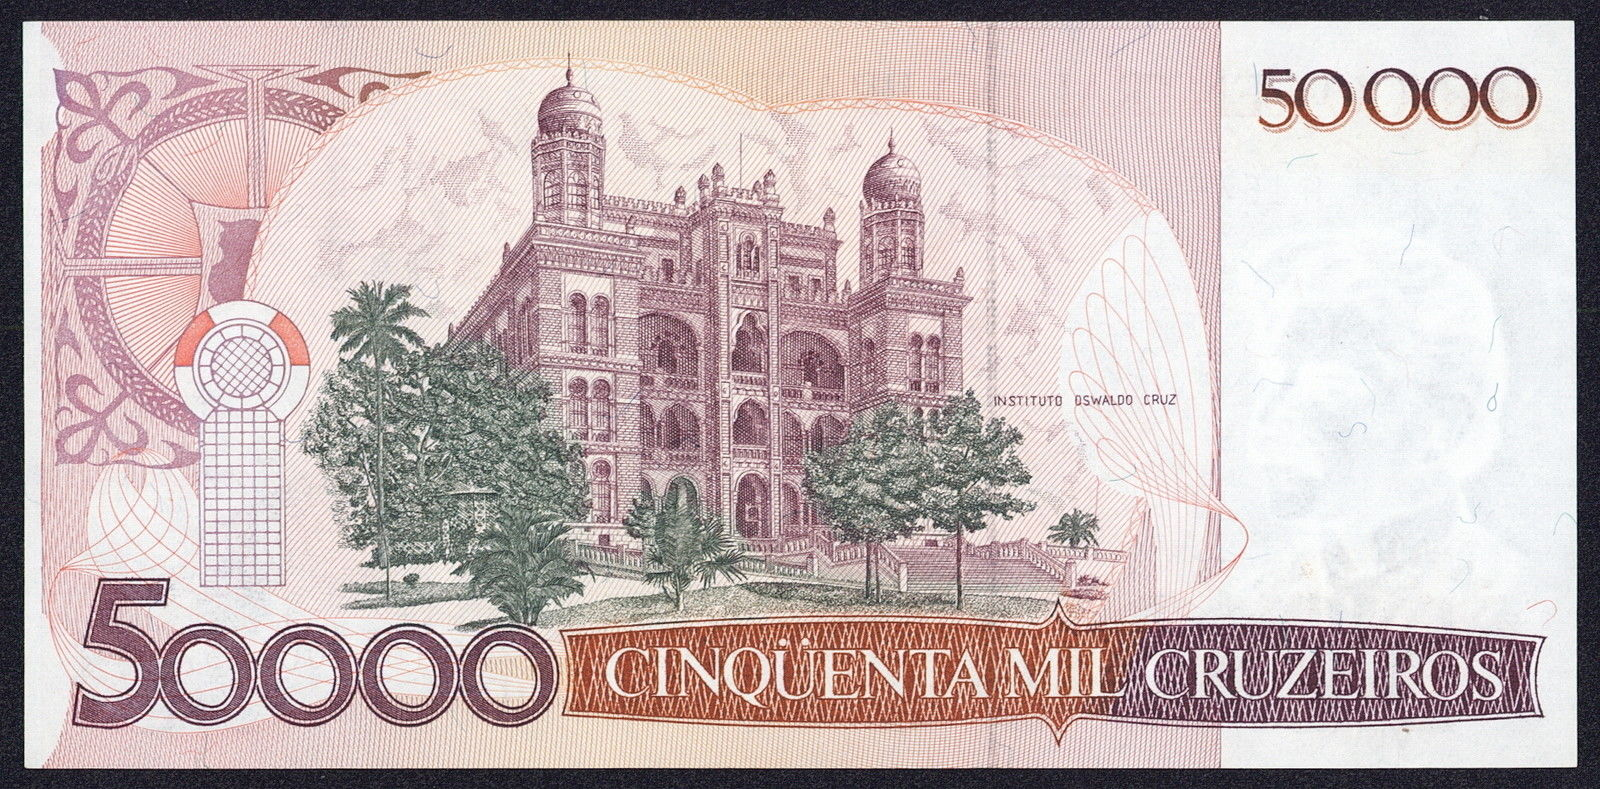 Brazil 50000 Cruzeiros banknote 1985 Oswaldo Cruz World Banknotes & Coins Pictures   Old Money ...